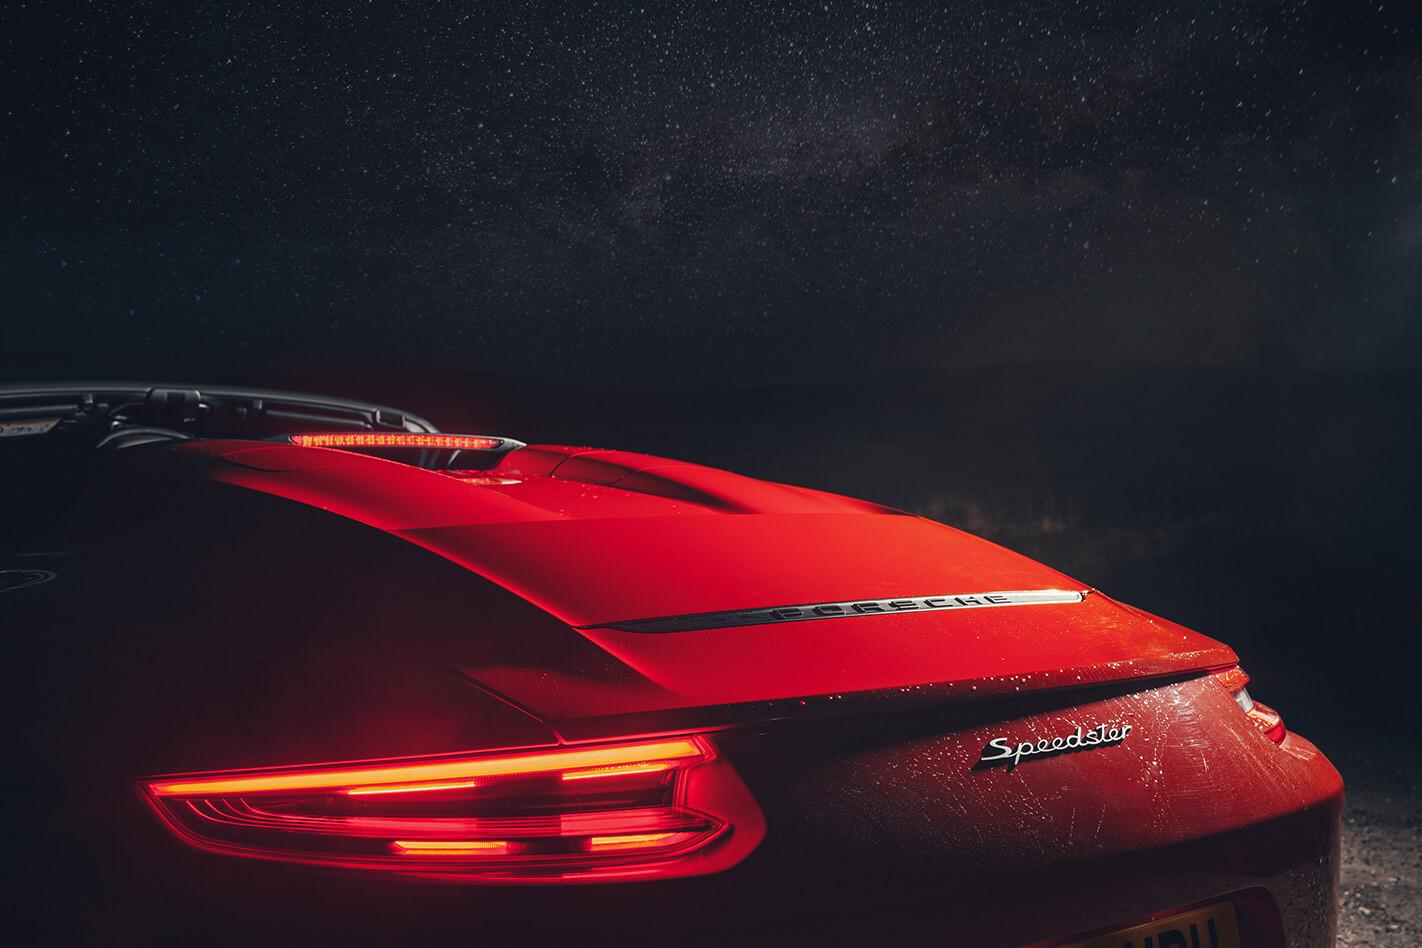 2020 Porsche 911 Speedster tail